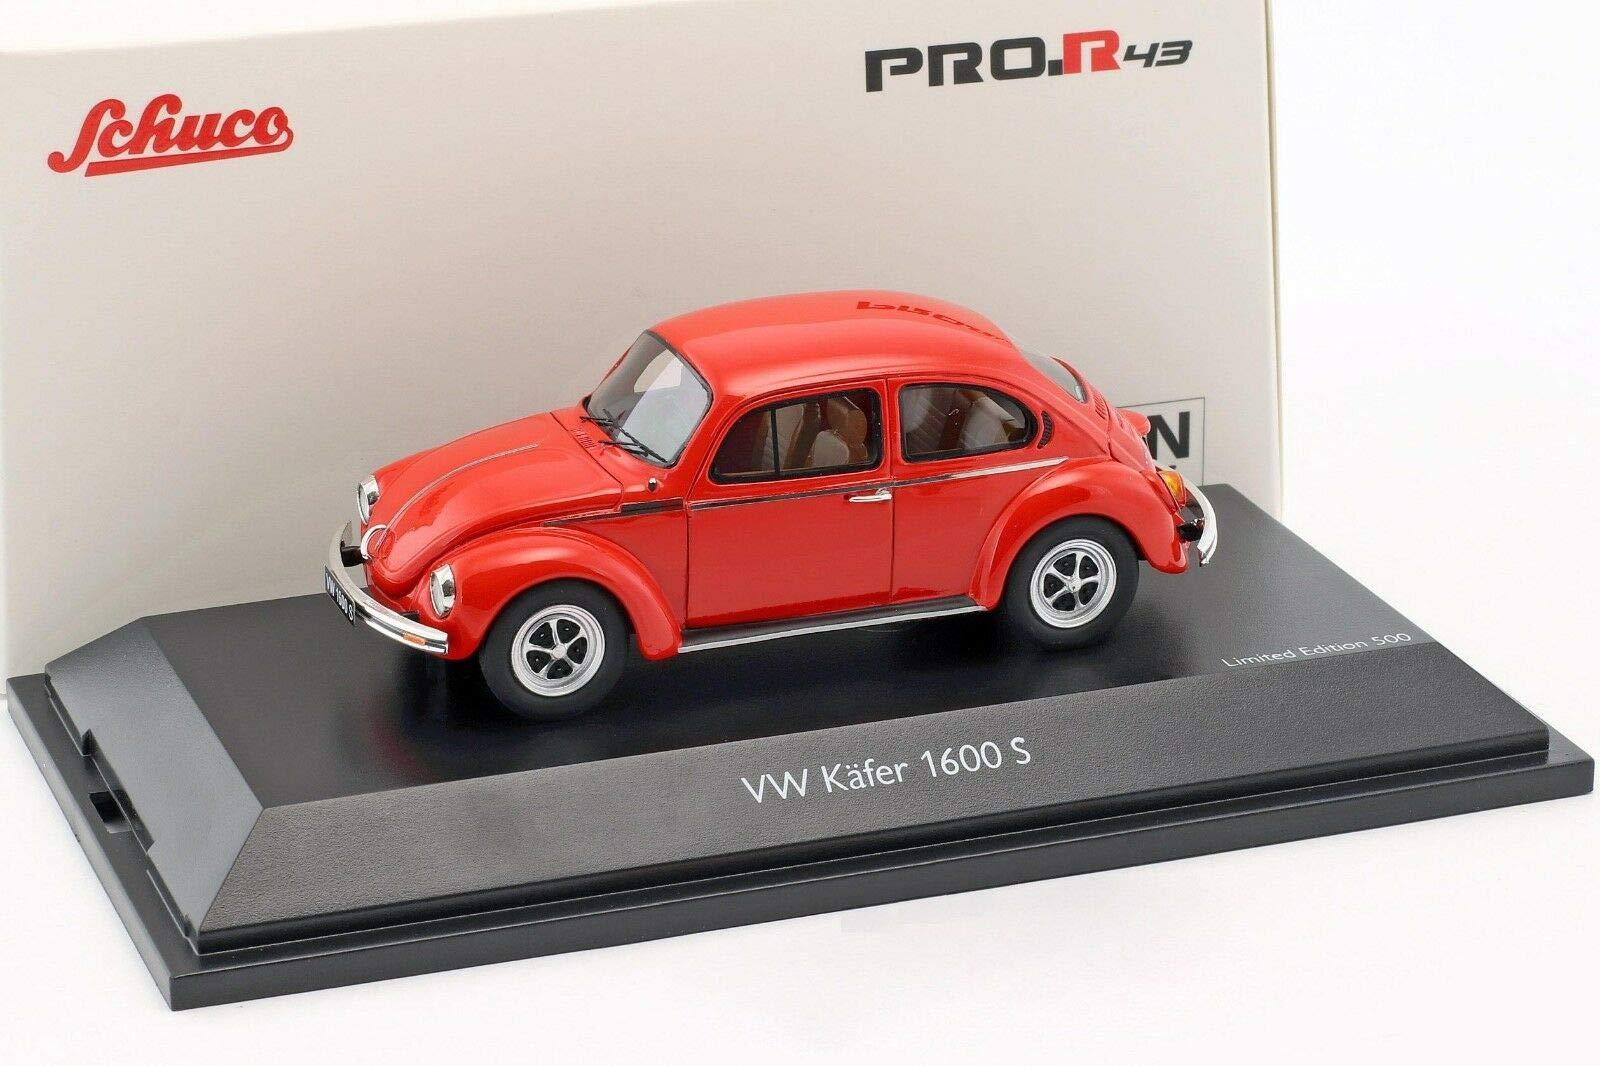 Simba Dickie 450903900Model Miniature VW Beetle 1600S 1: 43